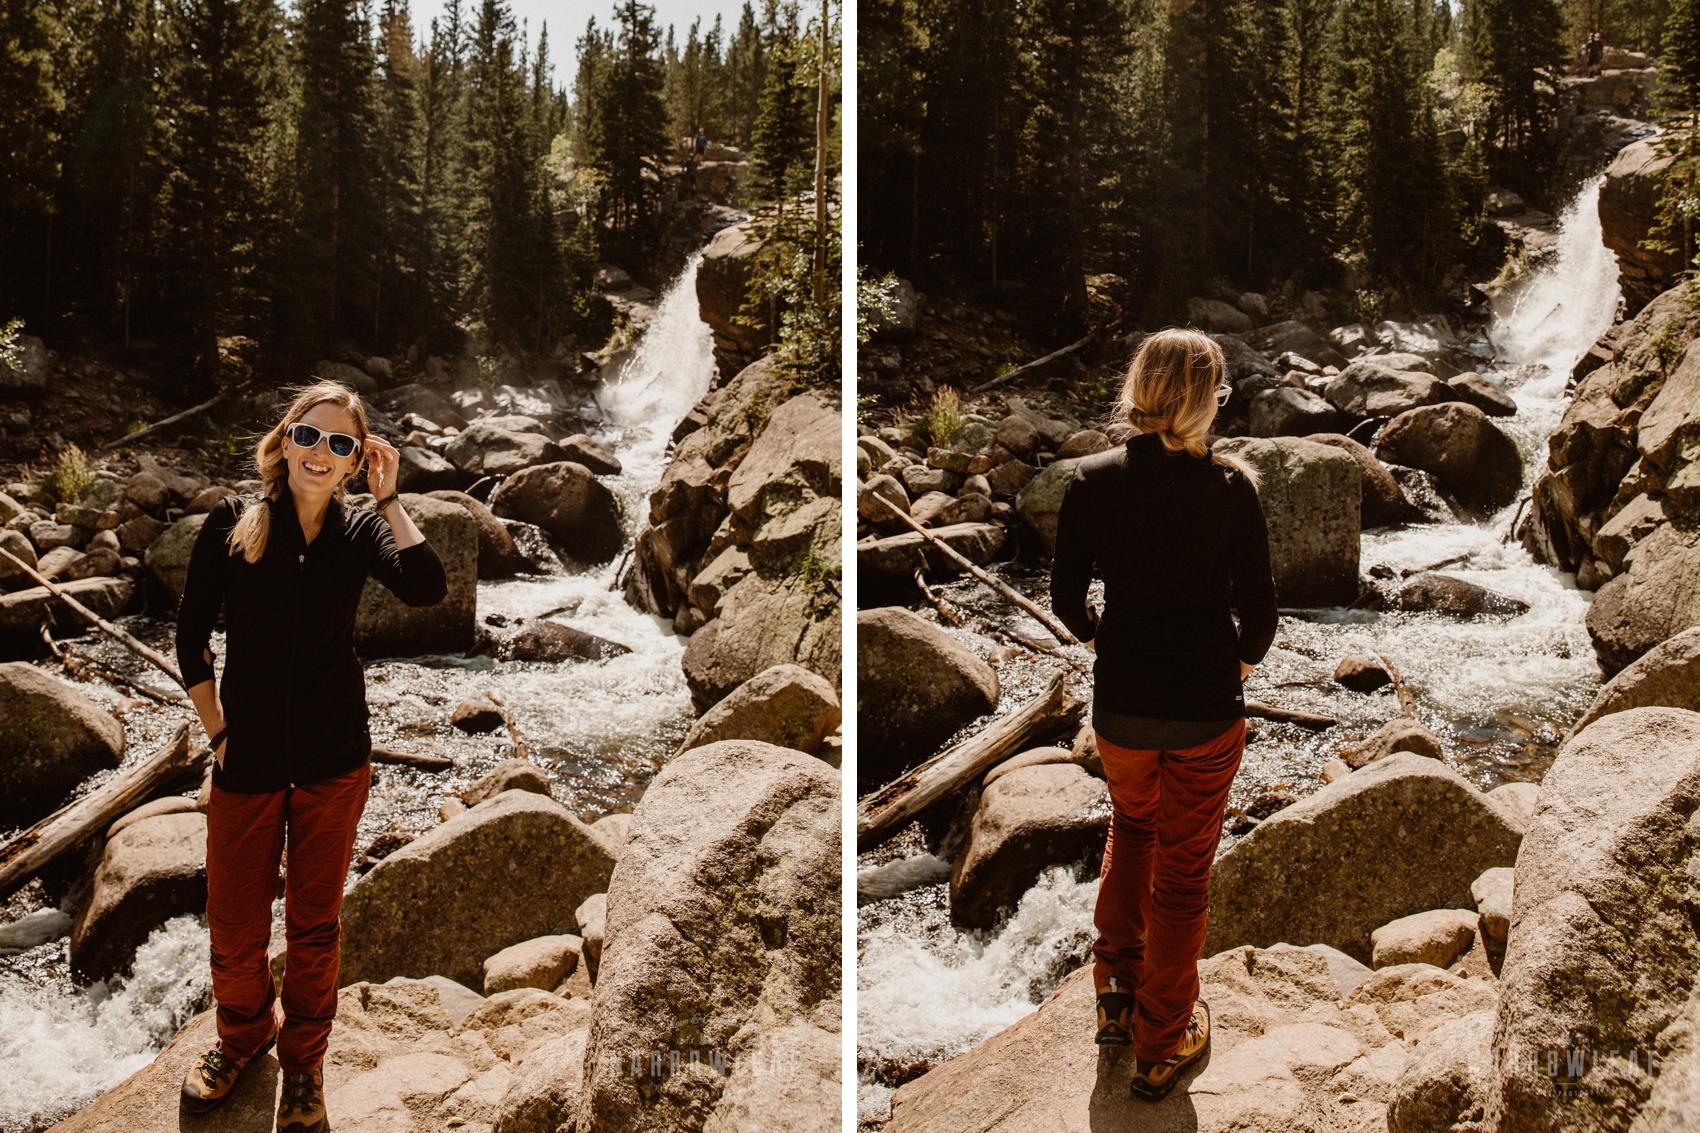 hiking-adventure-photographer-narrowleaf-photography001-002.jpg